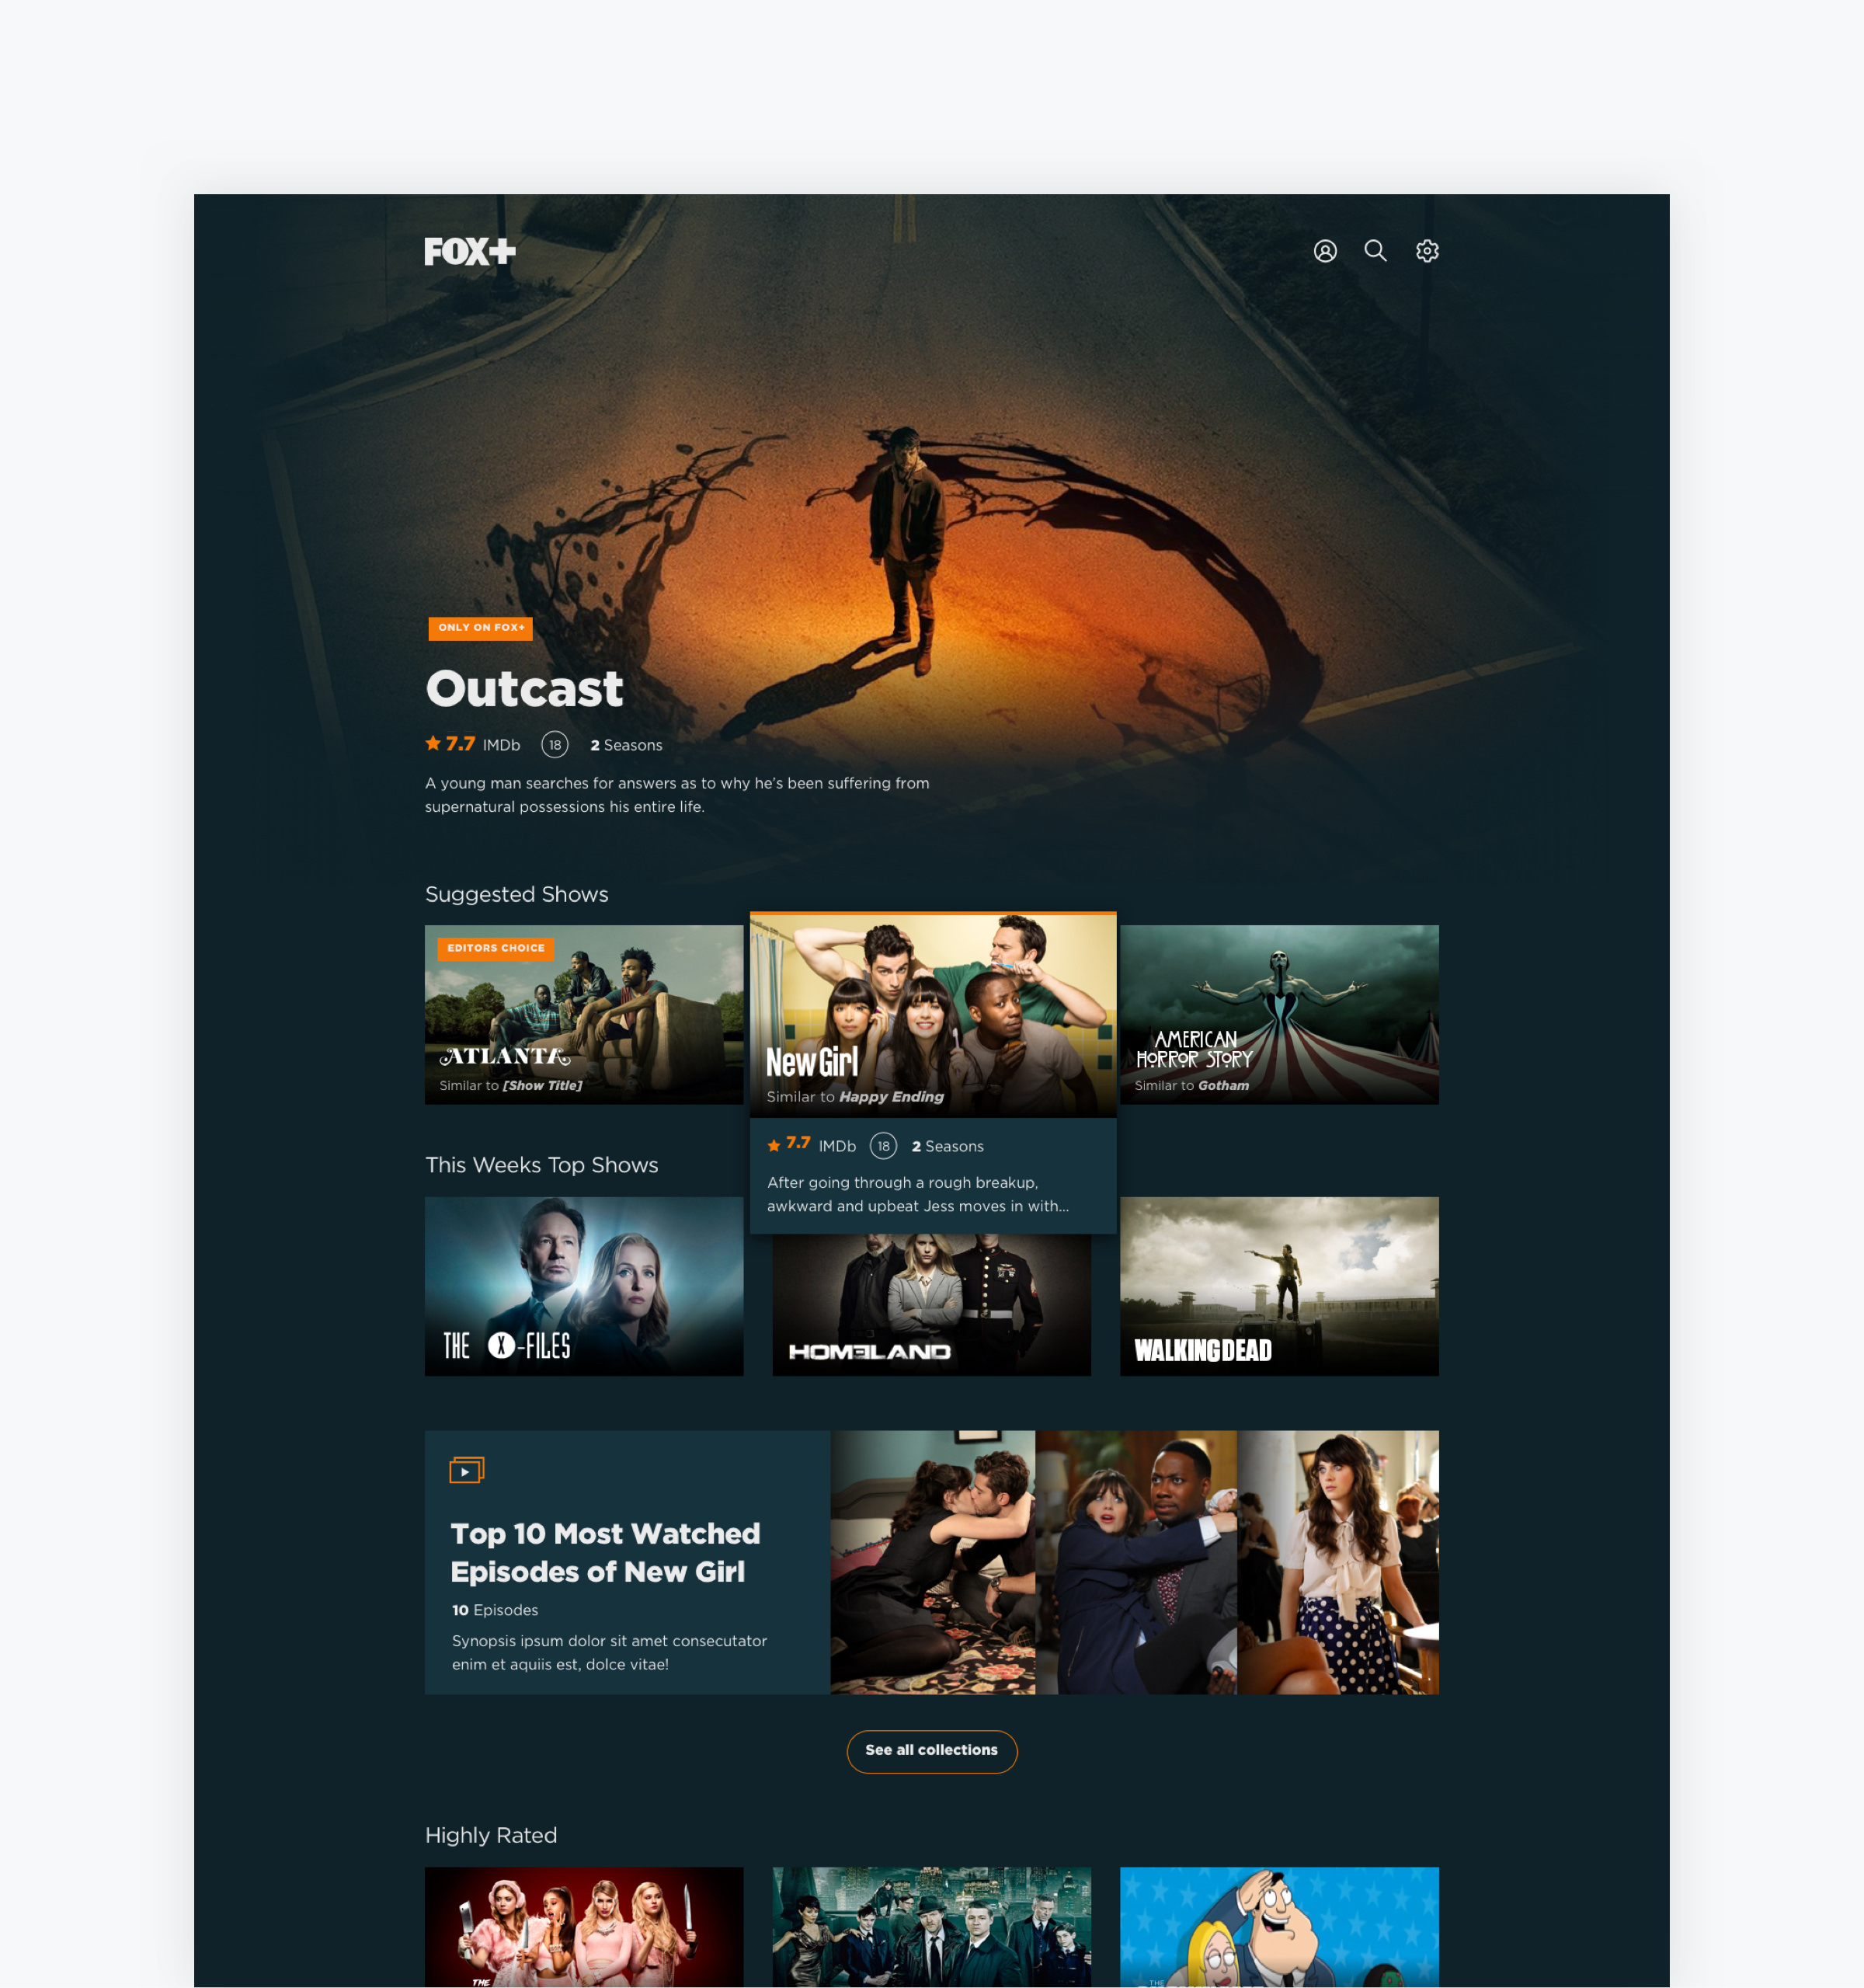 FOX - Showcasing the content